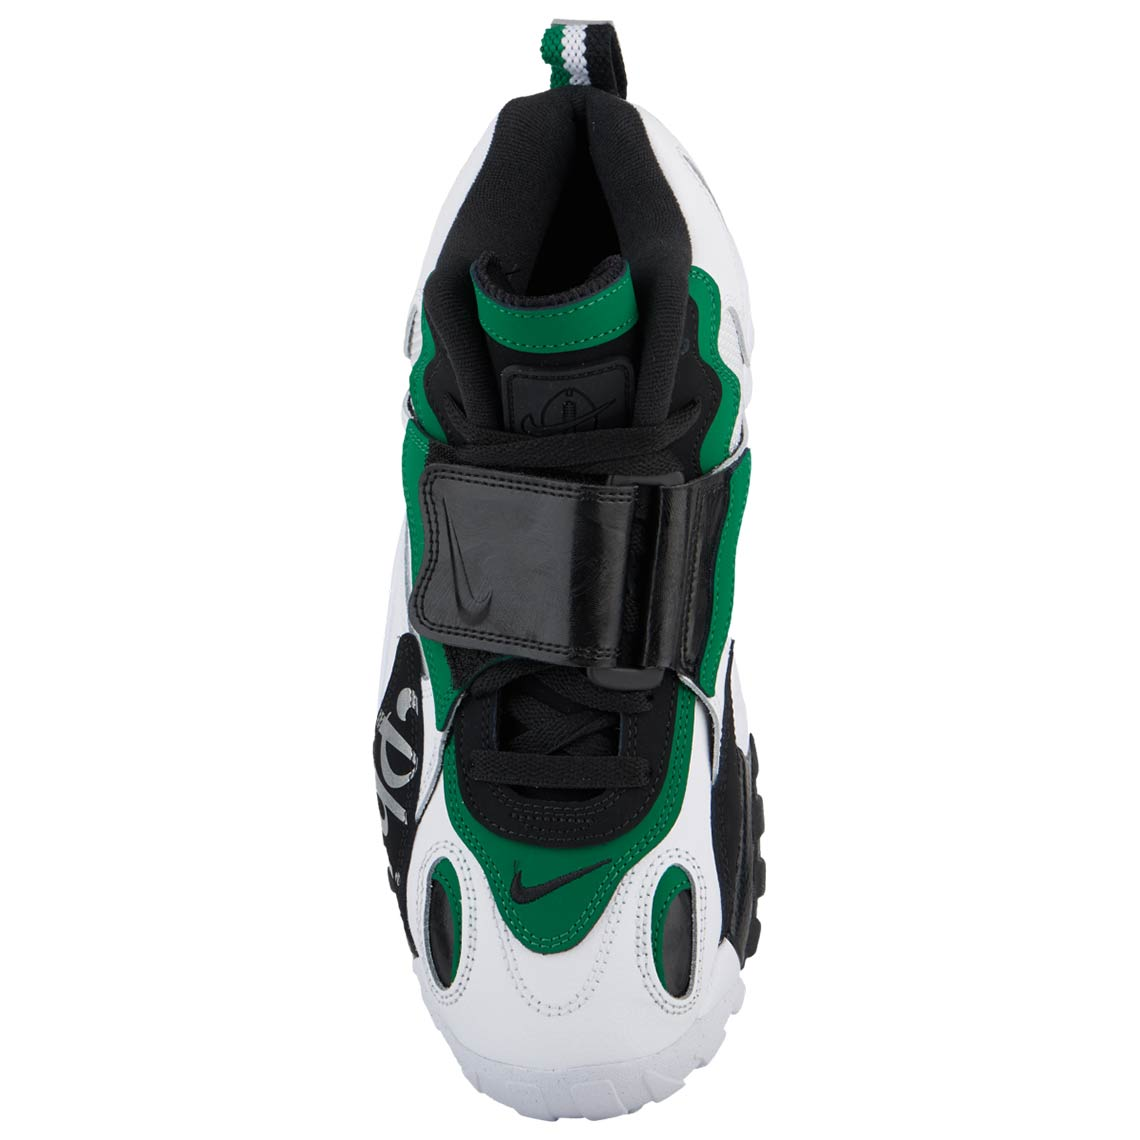 7883fe4c7f Nike Speed Turf Max Philadelphia Eagles Info | SneakerNews.com